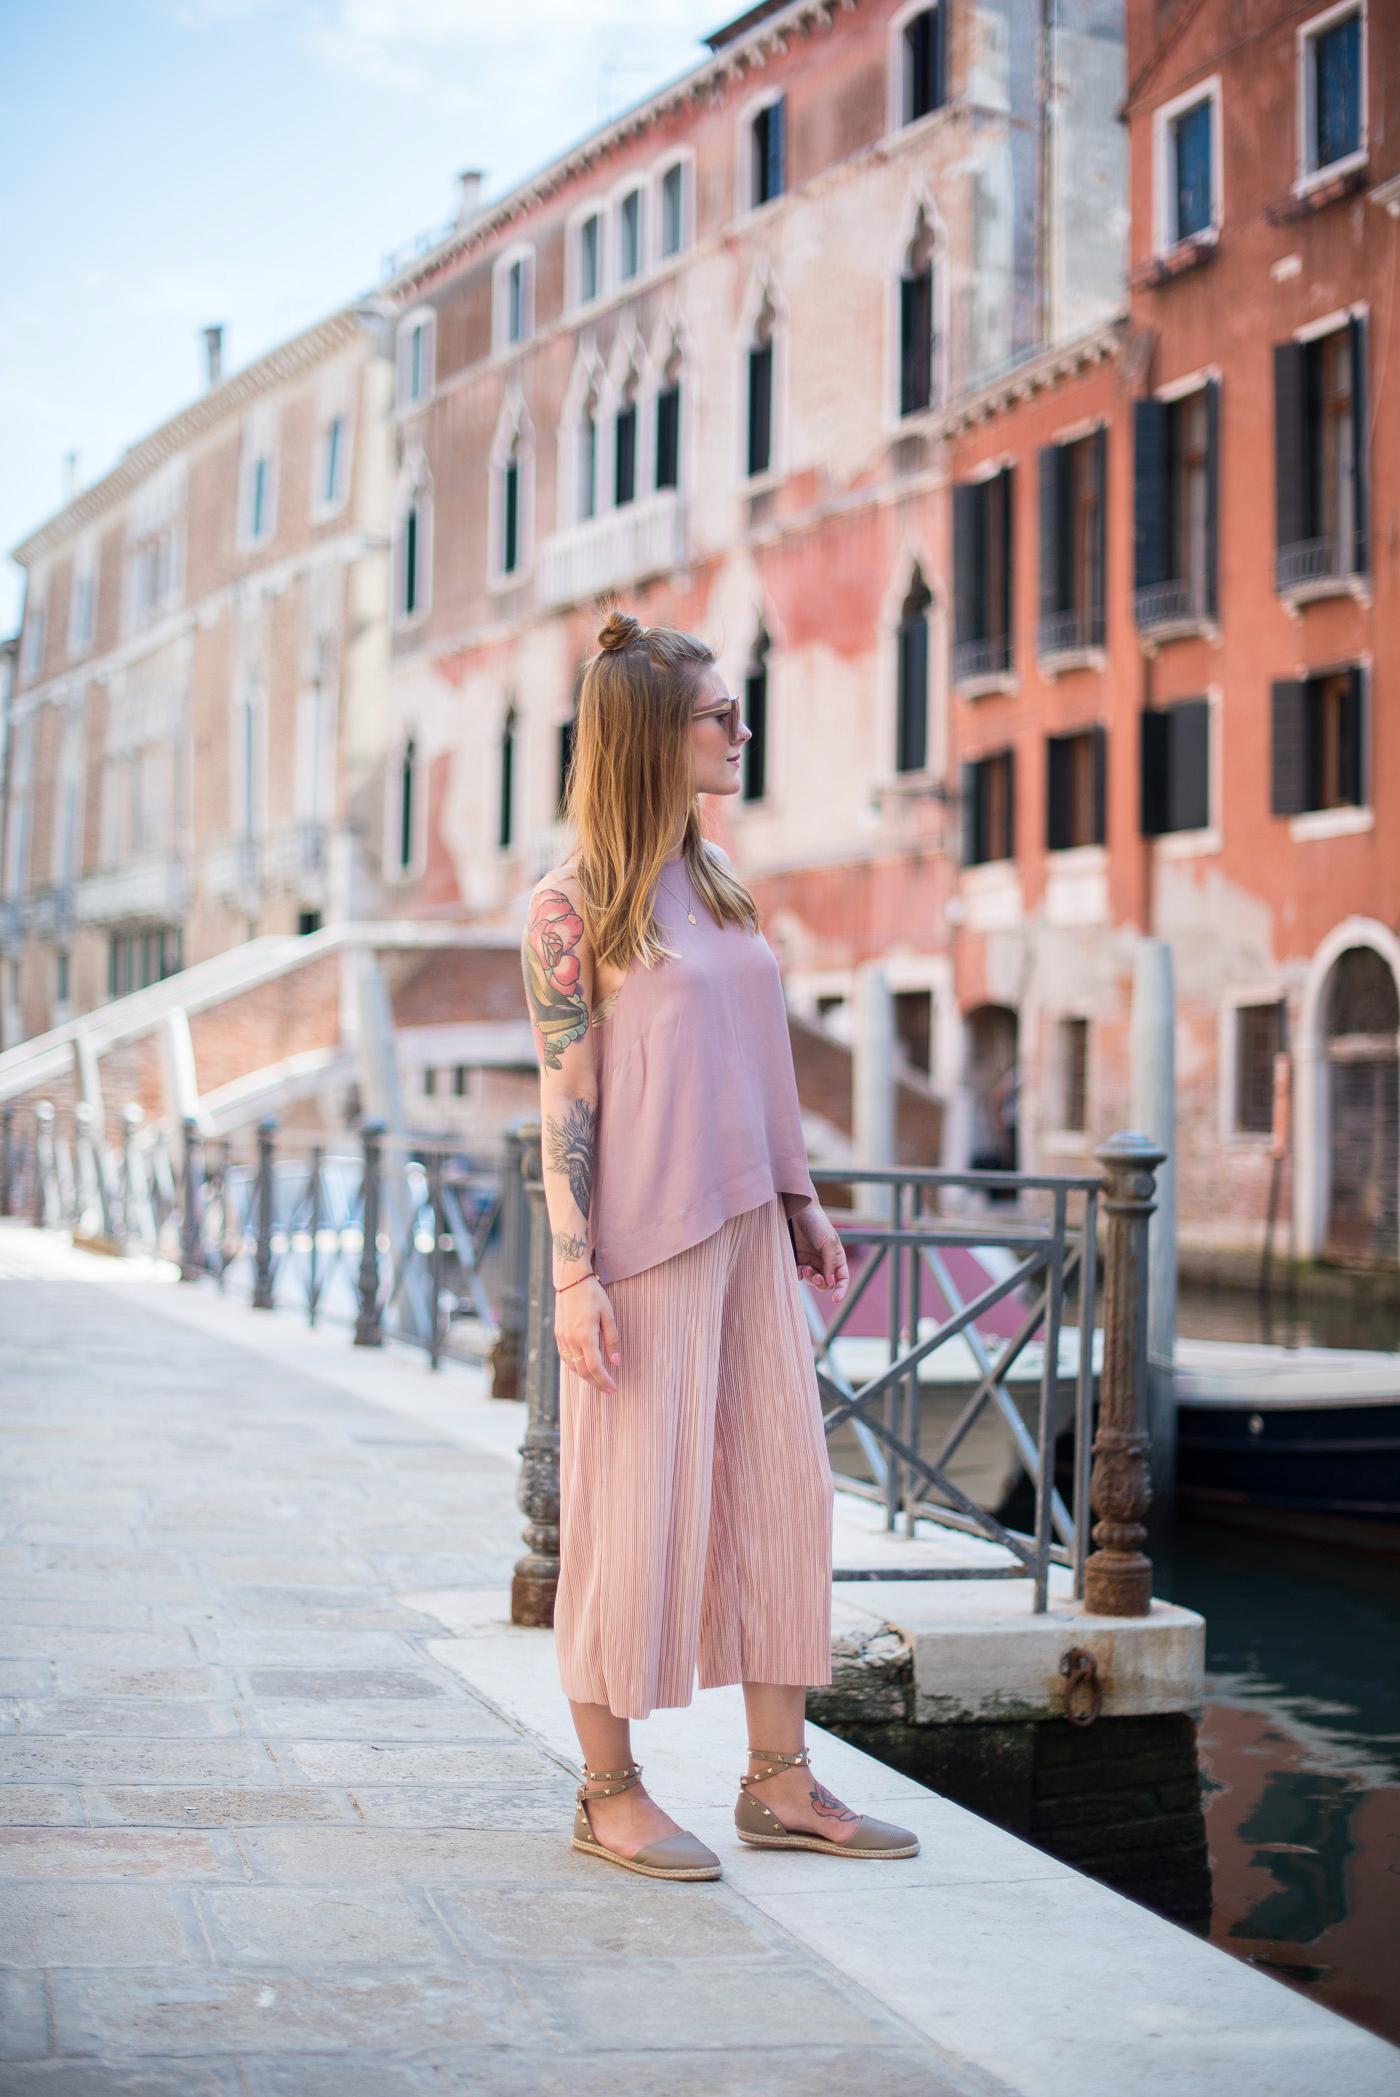 Candy_colors_culotte_outfit_in_Venezia_9